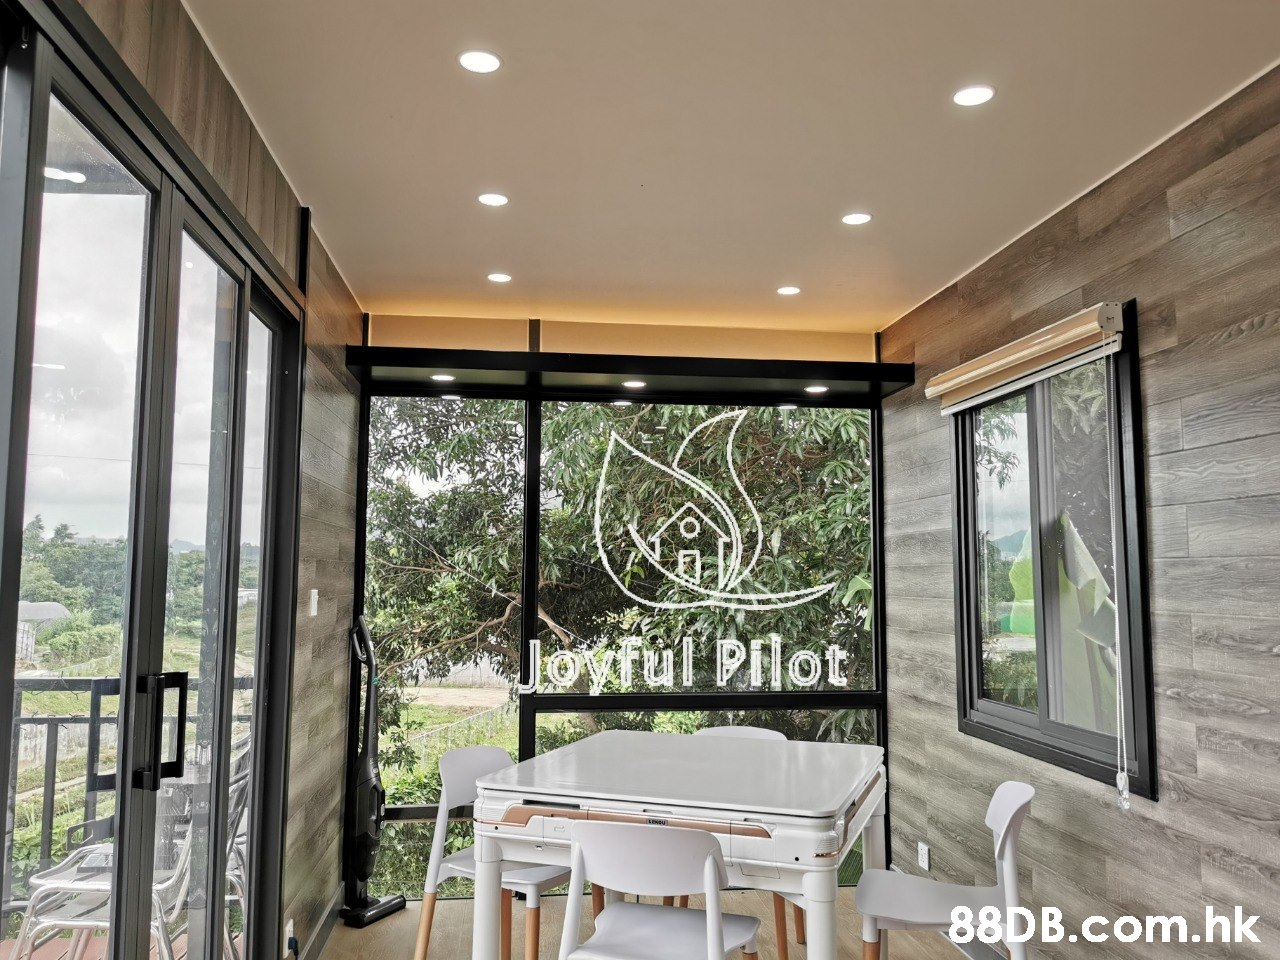 lo ful Plot .hk  Property,Room,Interior design,Building,House